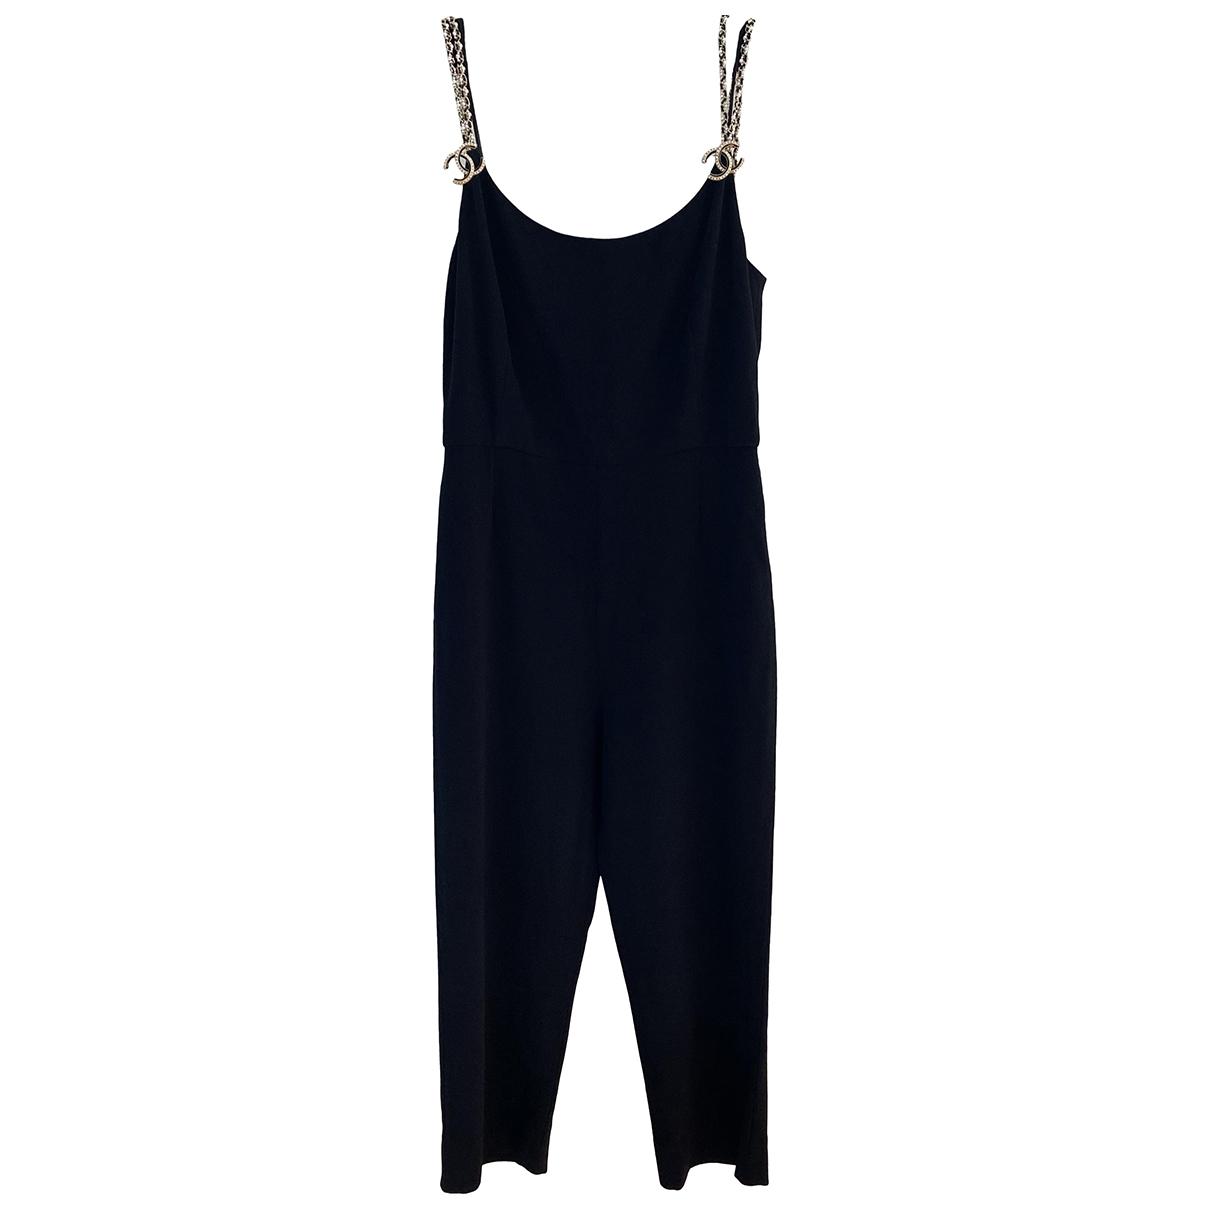 Chanel \N Black jumpsuit for Women 40 FR